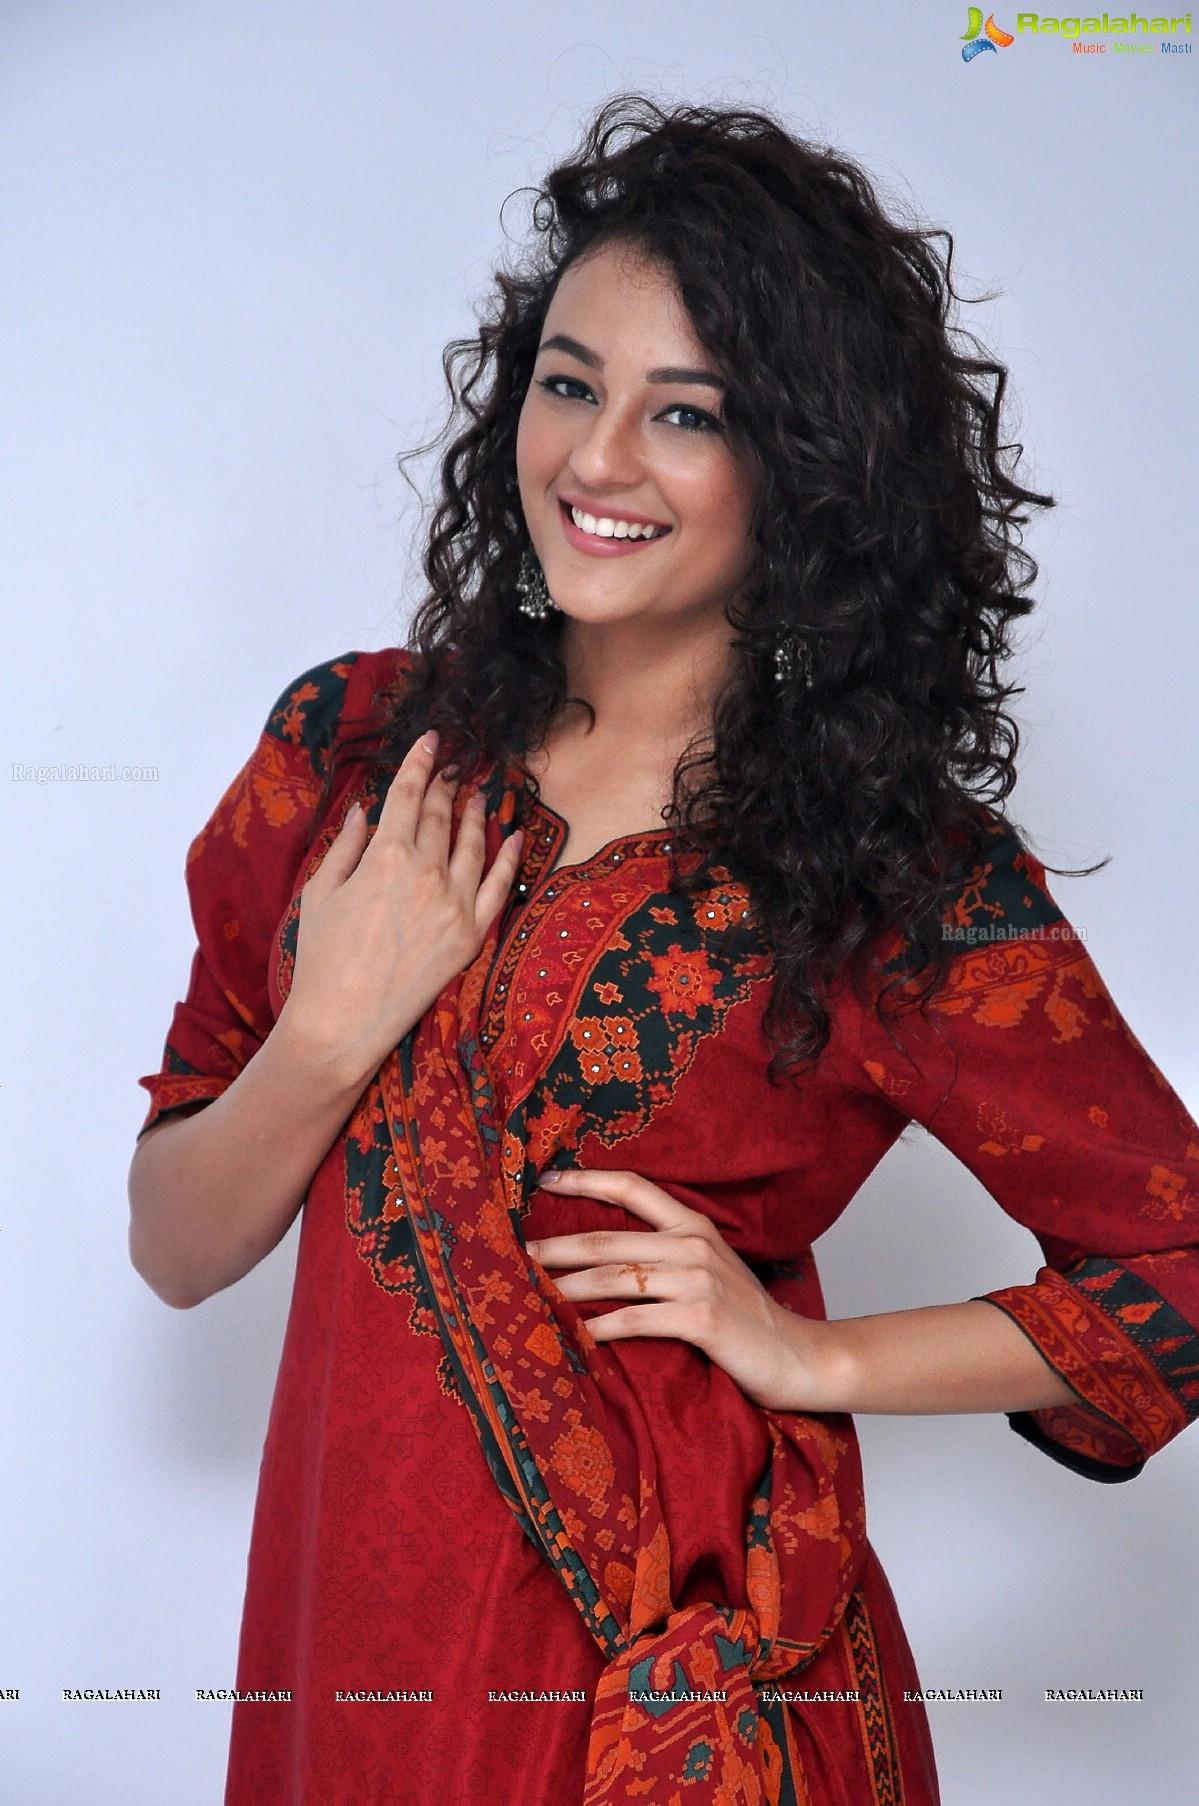 Seerat Kapoor Image 100 Telugu Cinema Heroines Photos Gallery